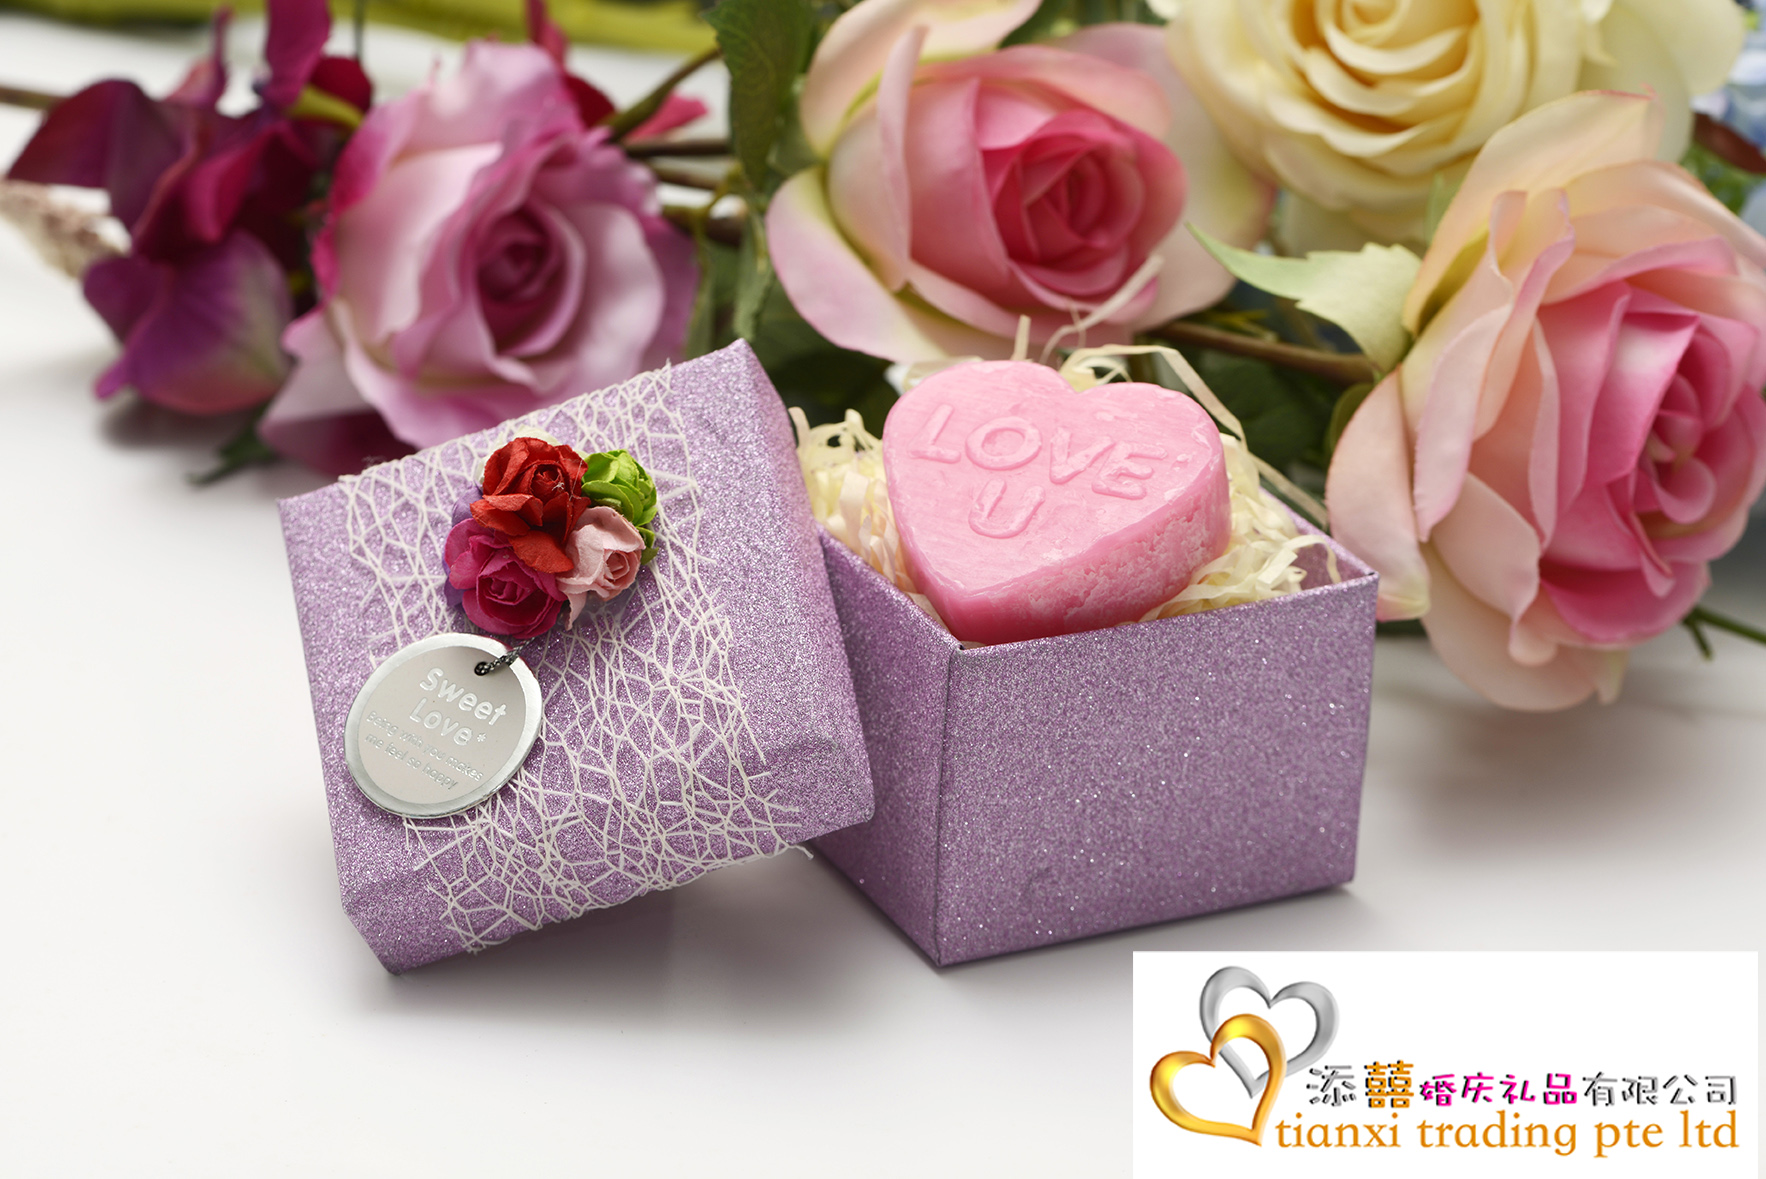 Directory of Wedding Gifts Vendors in Bali | Bridestory.com